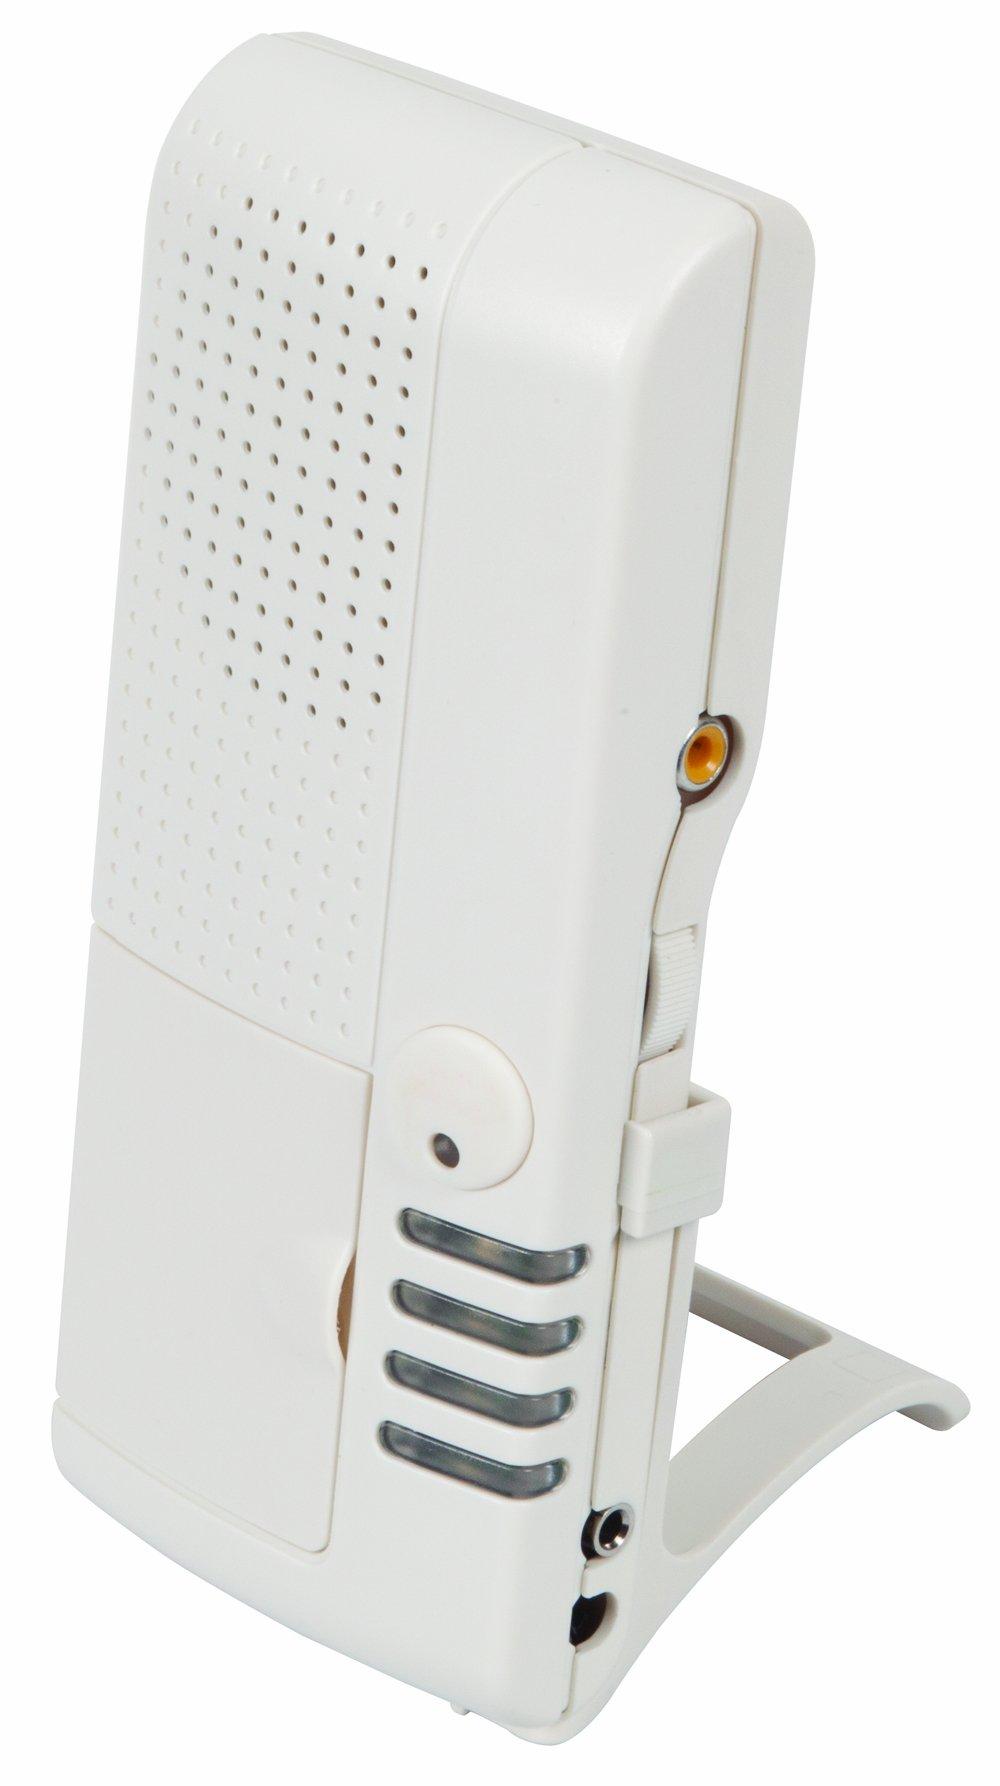 Safety Technology International, Inc.STI-V34150 Wireless Battery Powered Driveway Monitor with Voice Receiver by Safety Technology International, Inc. (Image #4)